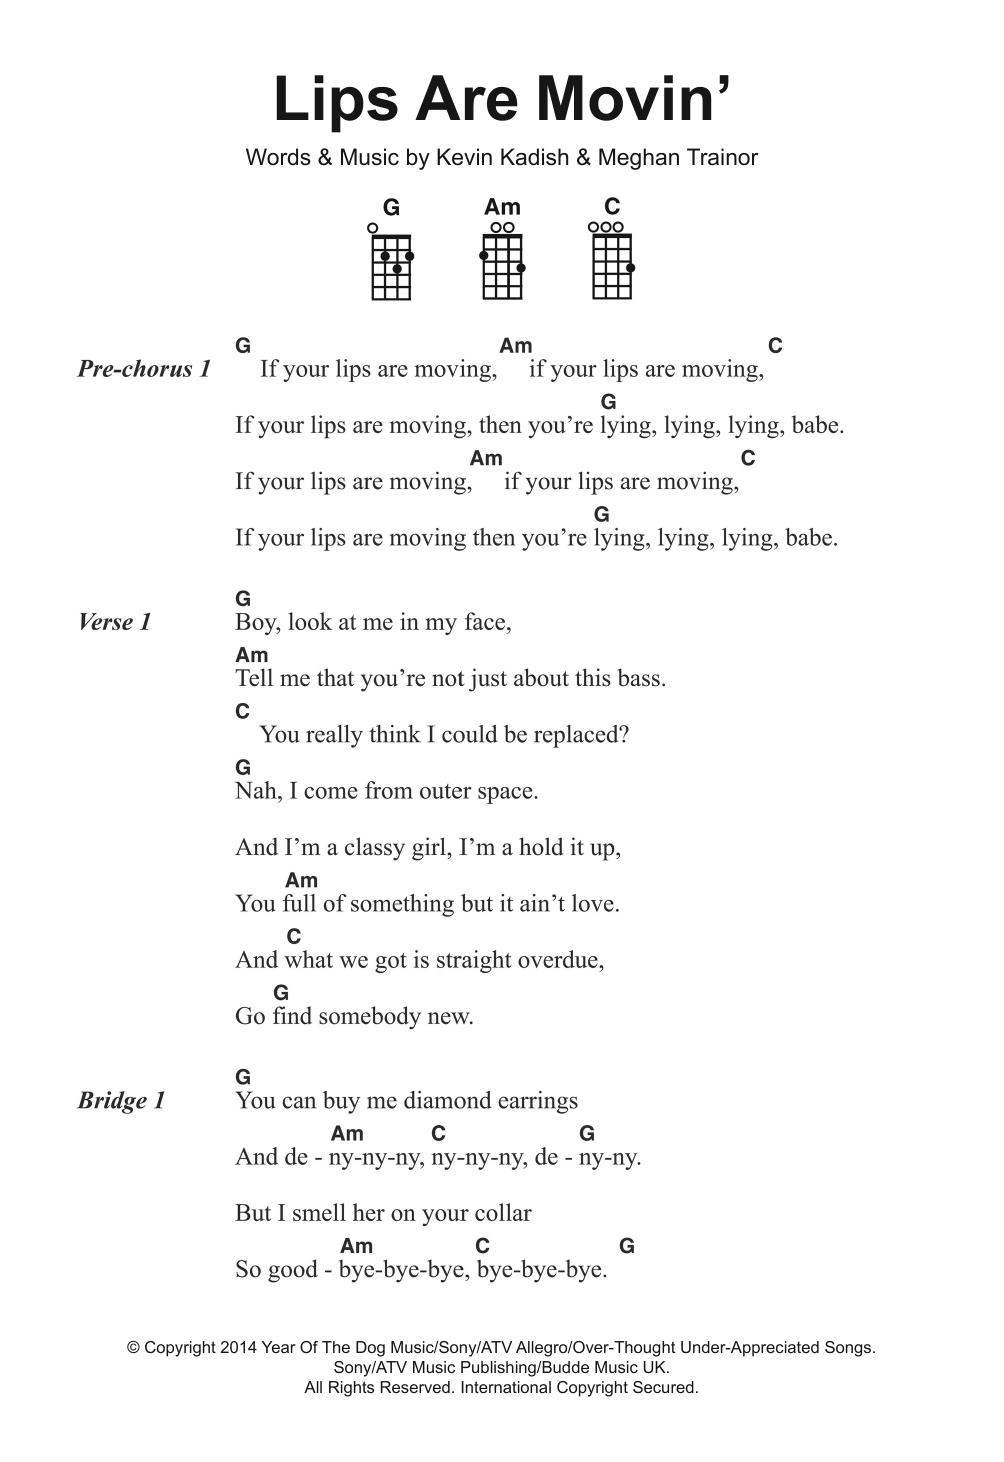 Your love is moving lyrics